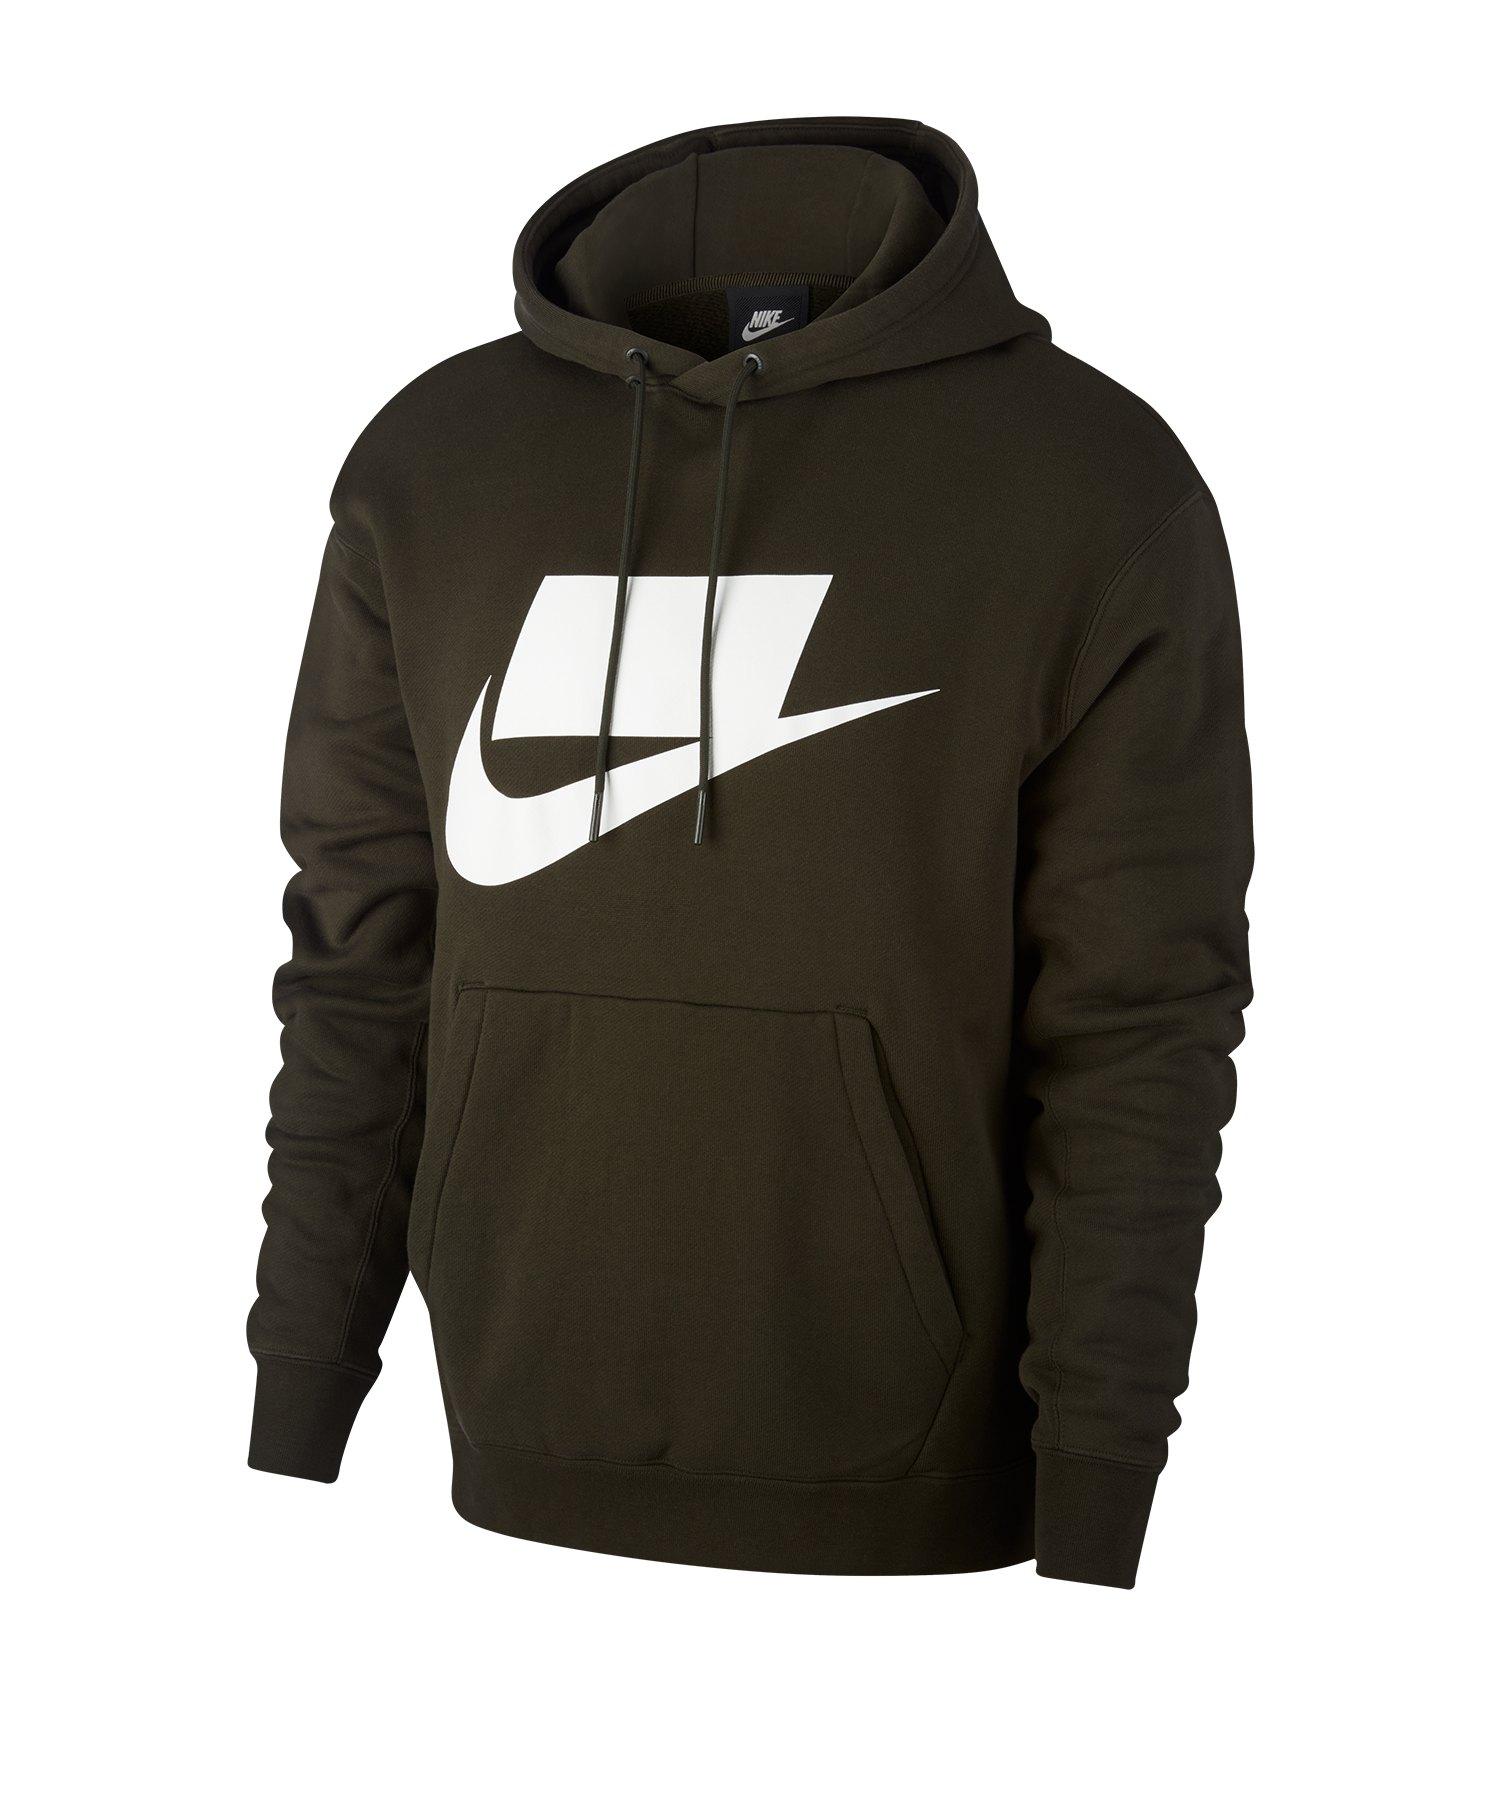 Nike Sweatshirt mit RUSH SOCCER Logo 100% Baumwolle